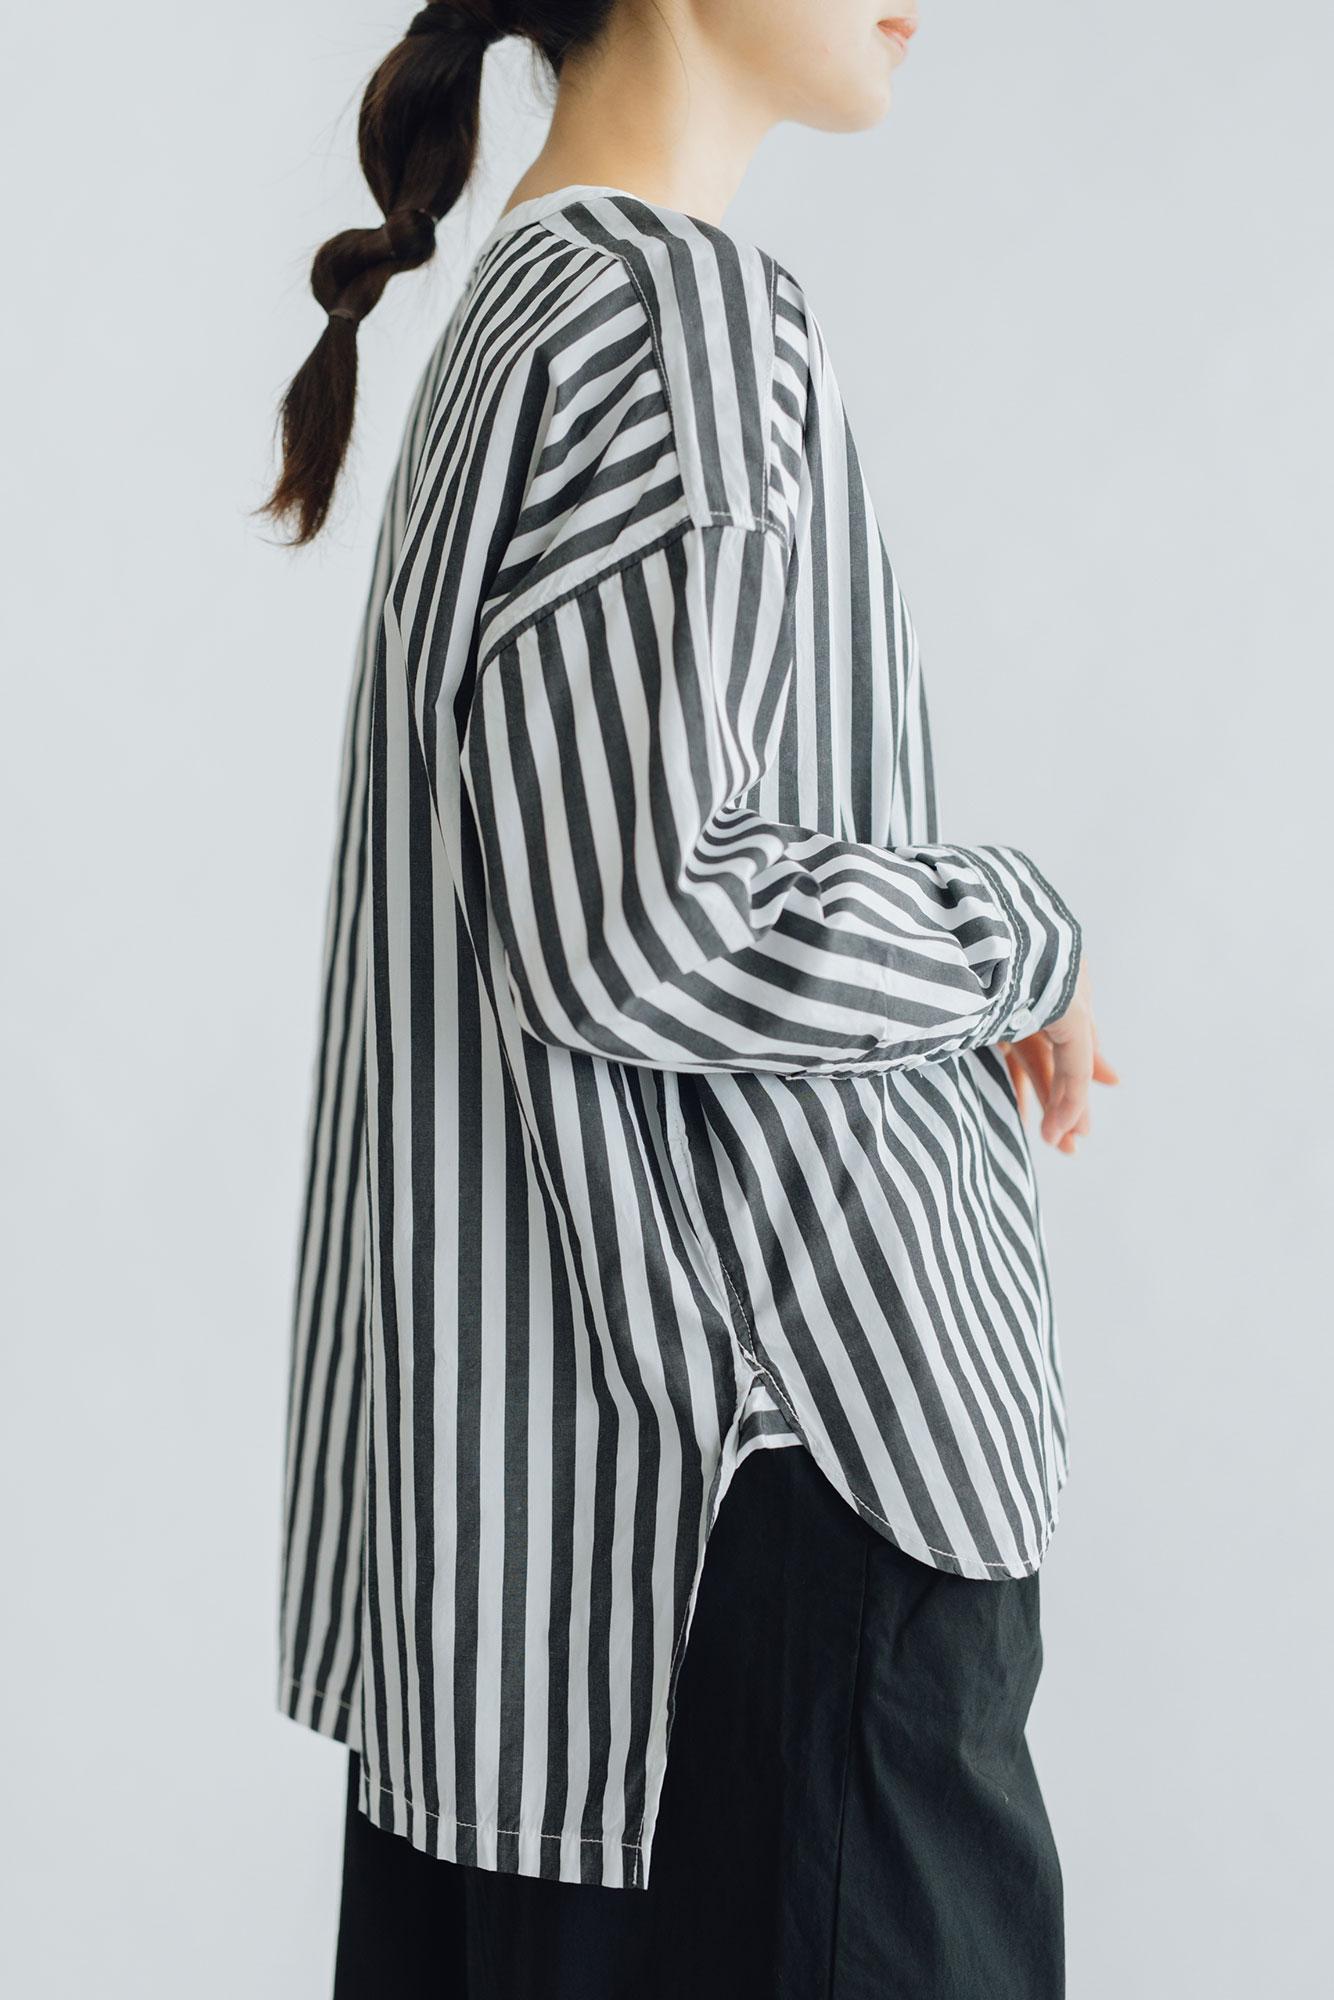 UNIVERSAL TISSU バーバーストライプ ワーキングシャツ